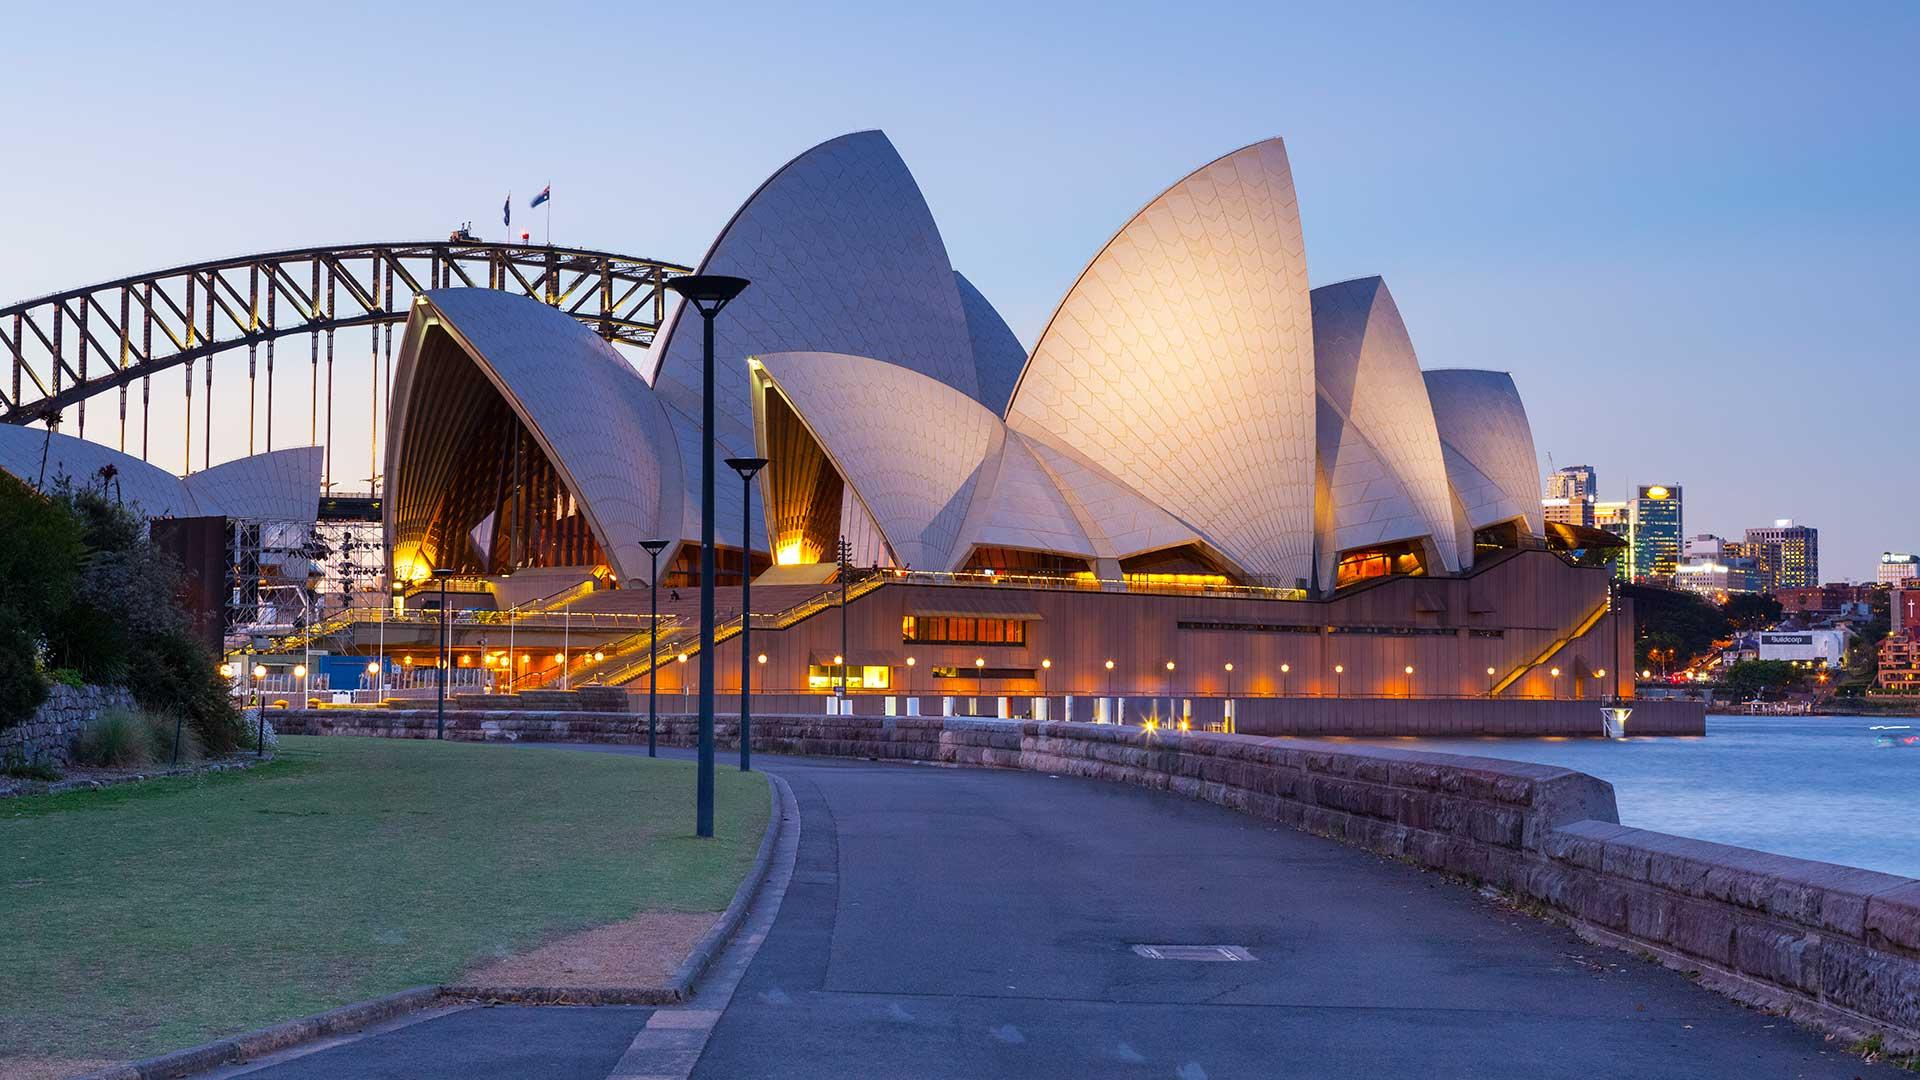 Sydney Opera House and Harbor Bridge, Darling Harbor, Sydney, Australia